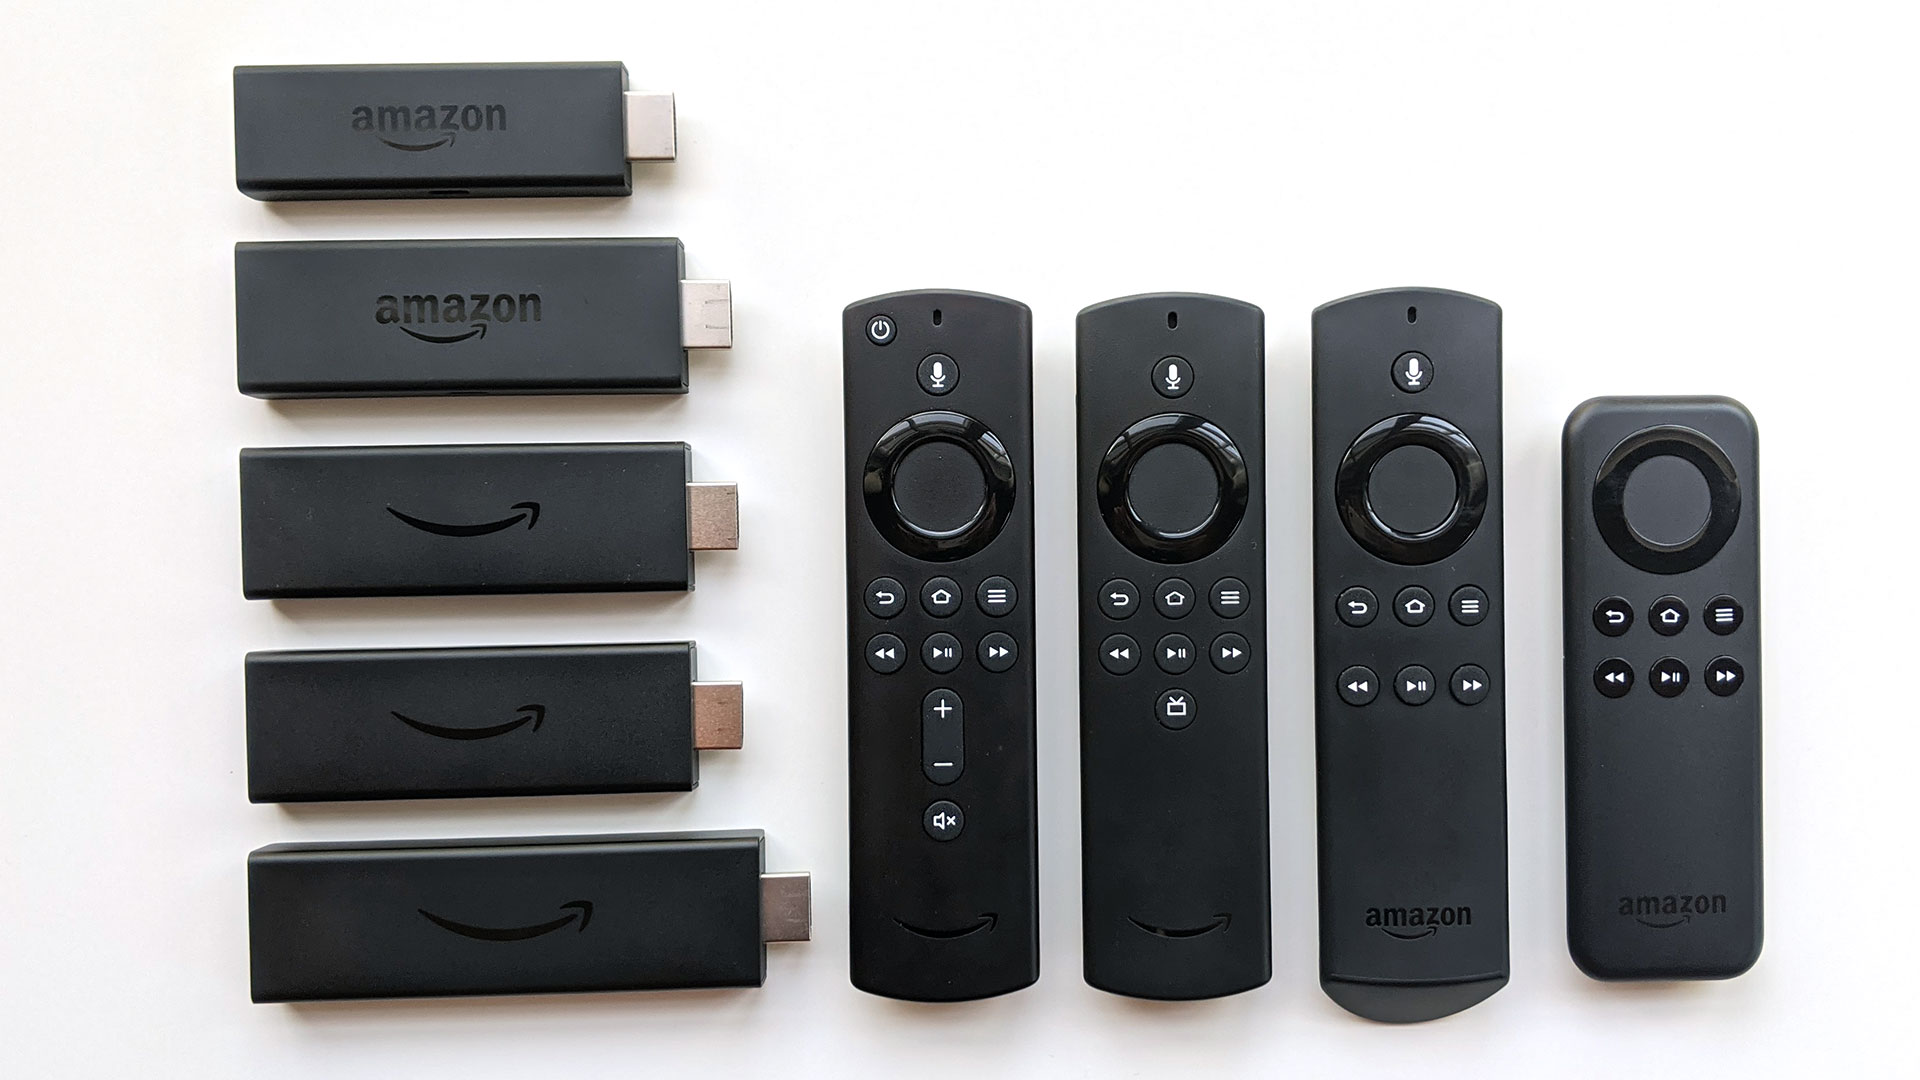 Fire Tv Stick 3 Stick Lite Share The Same Model Number And Are The Same Size As The Fire Tv Stick 2 Aftvnews